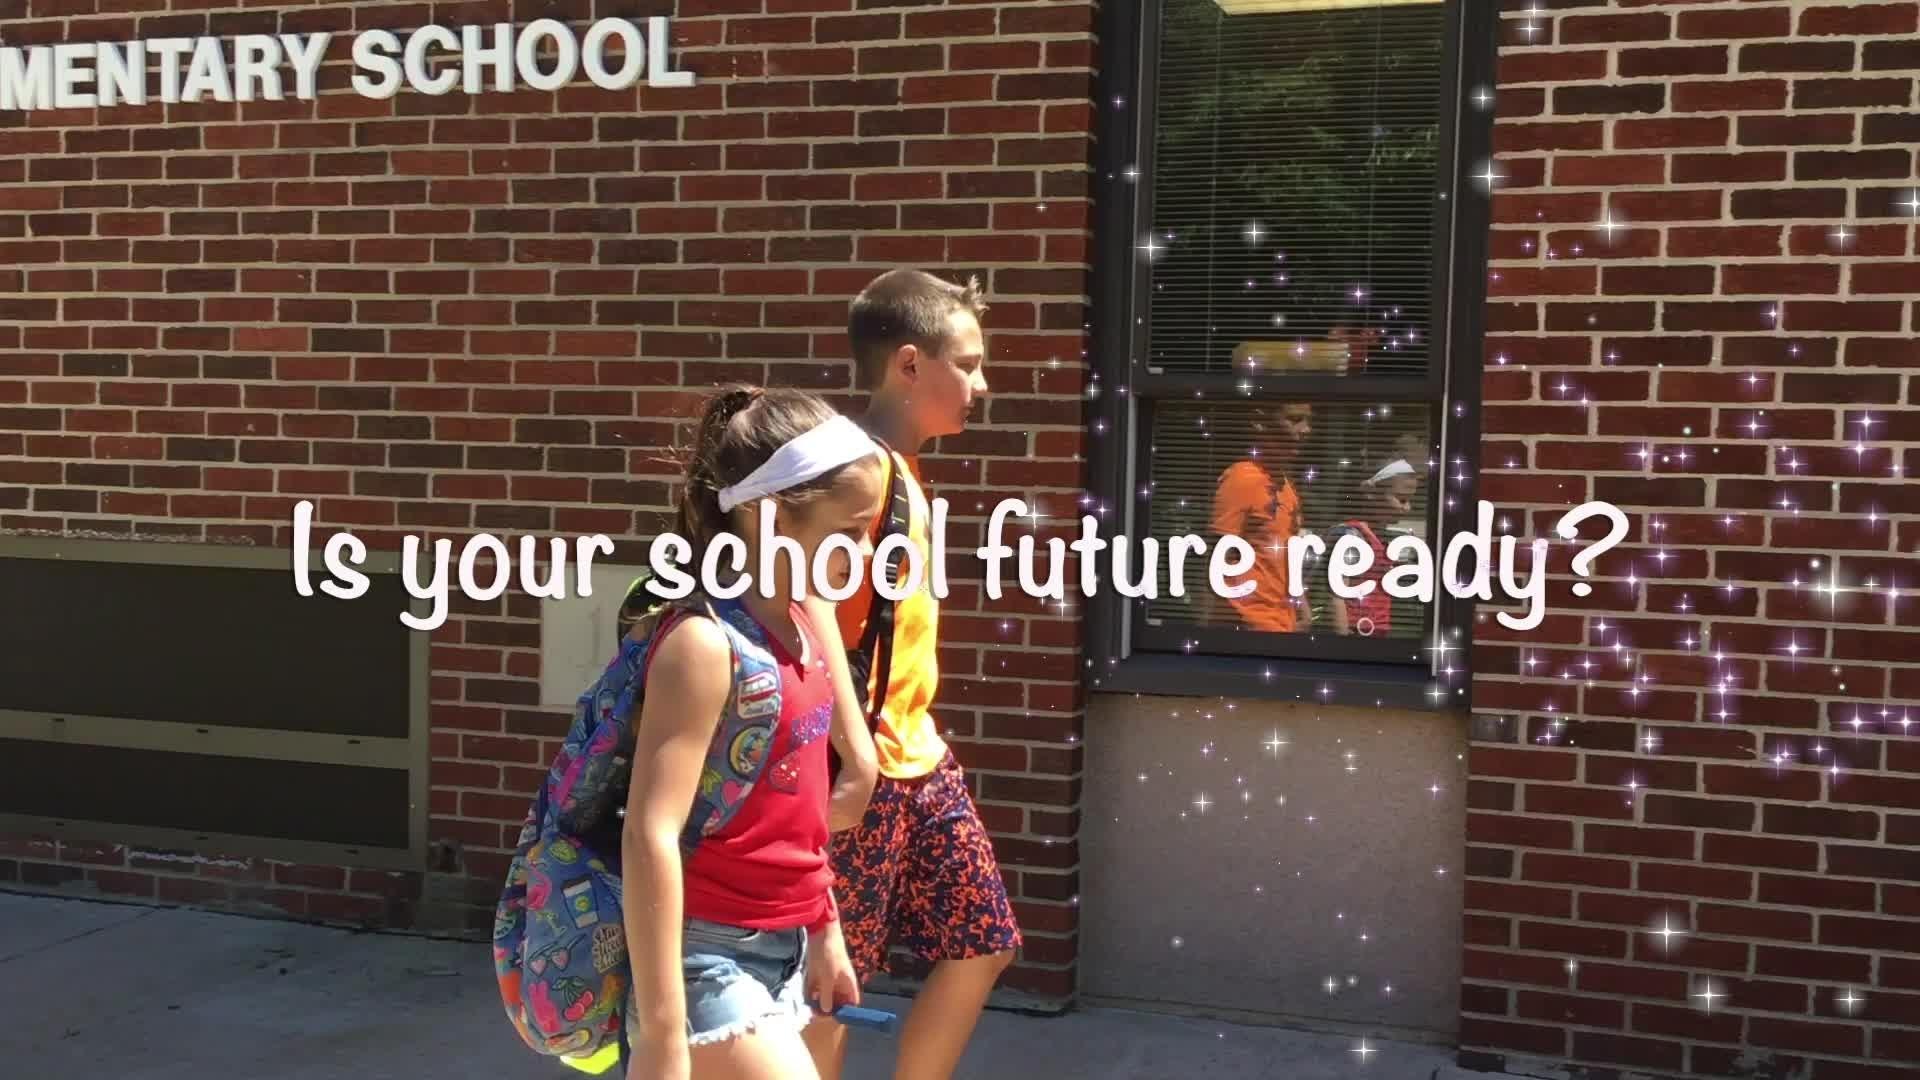 Et Hamilton School / E.t. Hamilton School_E T Hamilton School Calendar